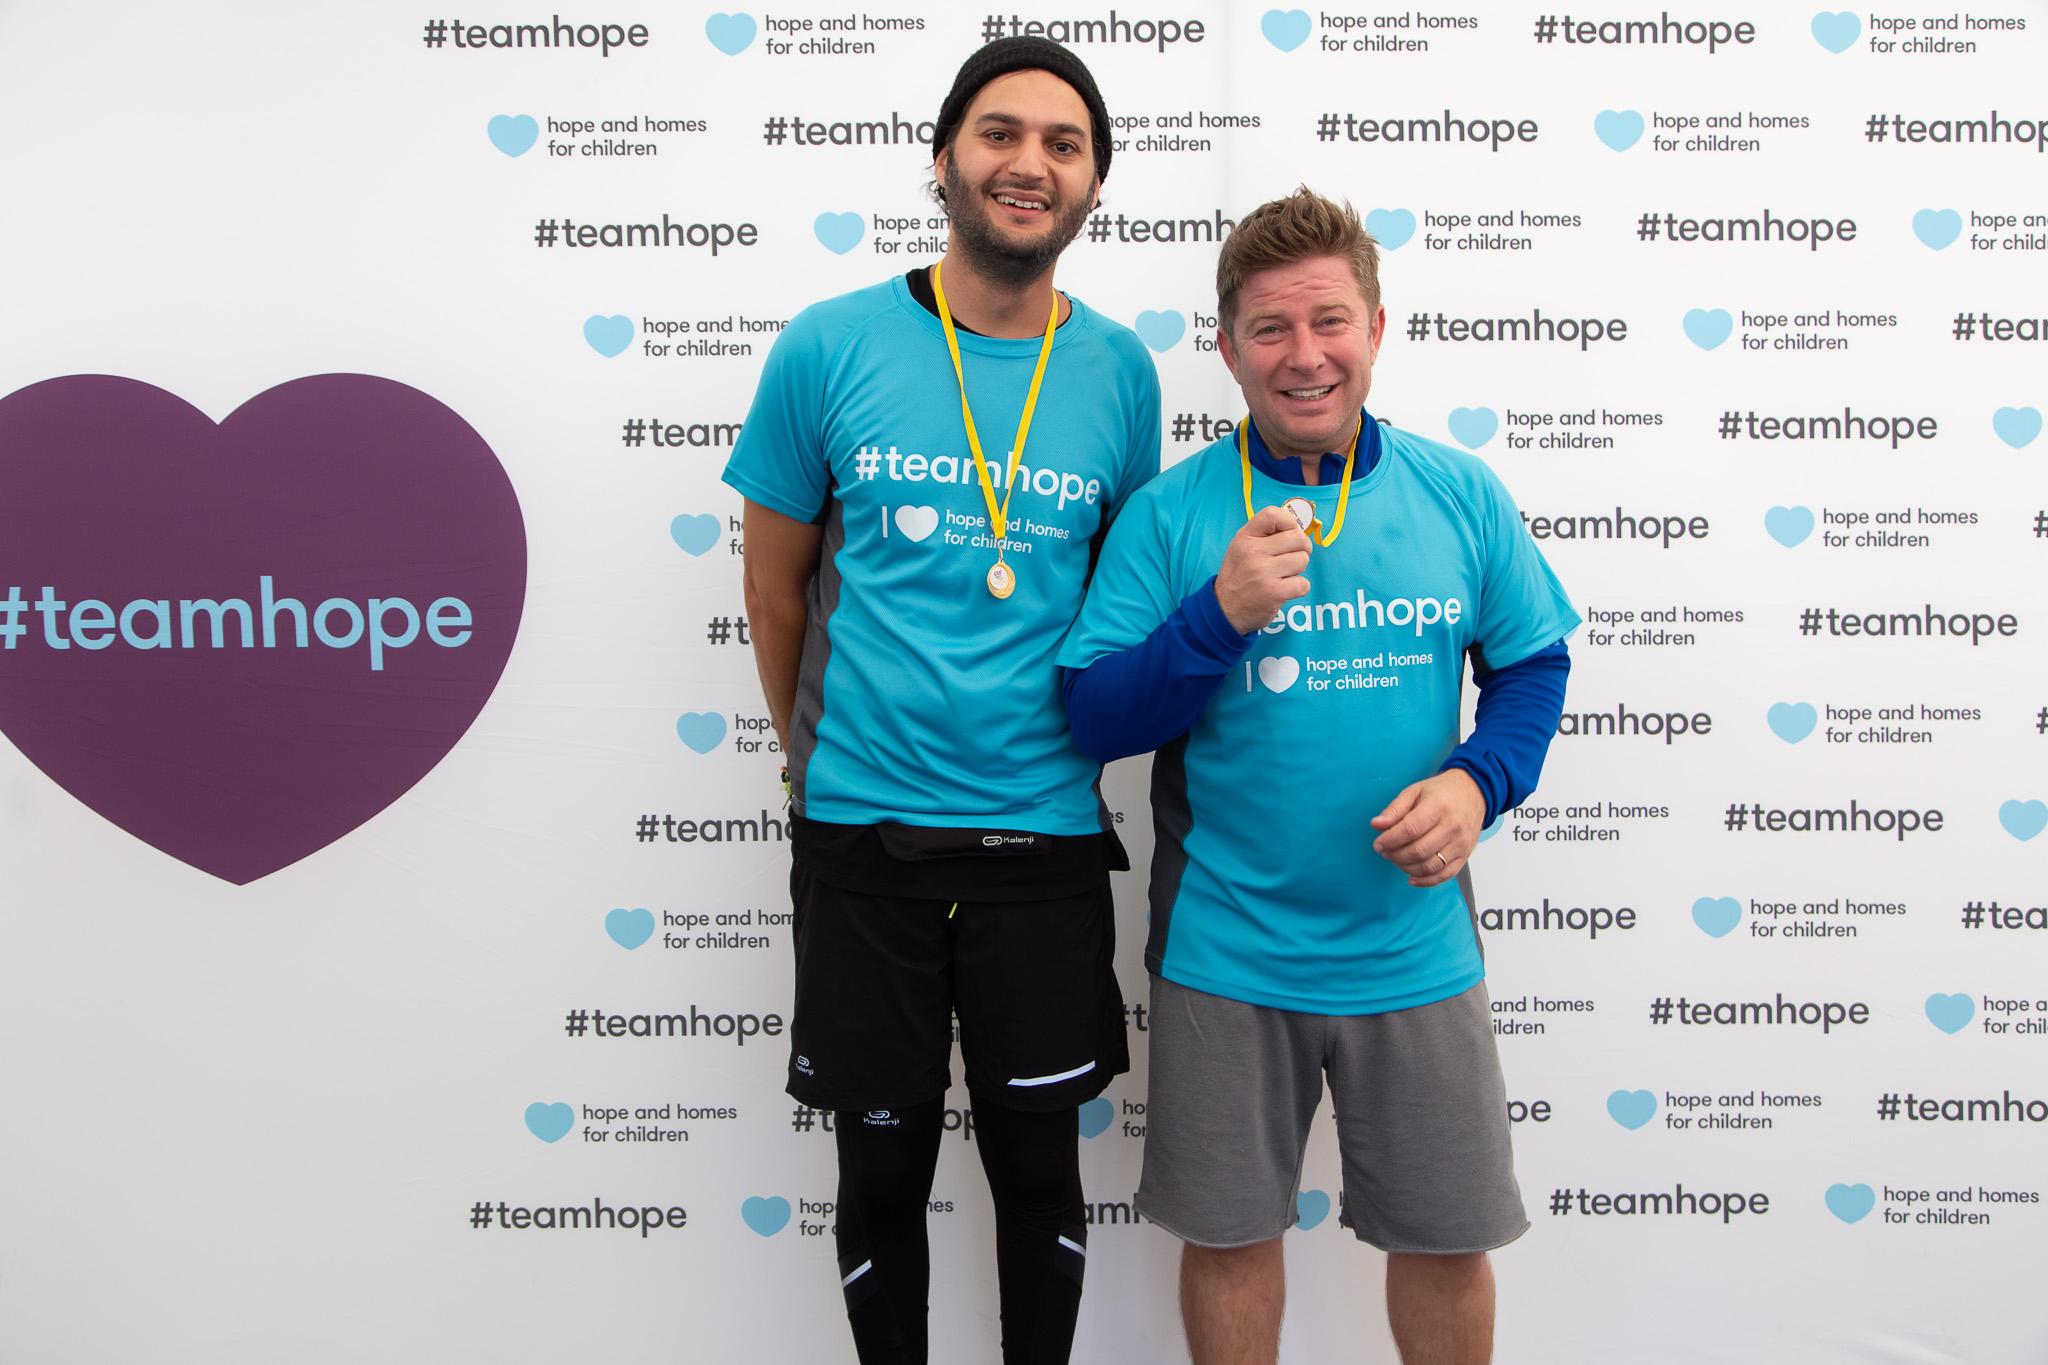 Pavel Bartos_Omid Ghannadi_Maraton_Hope and Homes for Children_Foto Mihnea Ciulei.jpg